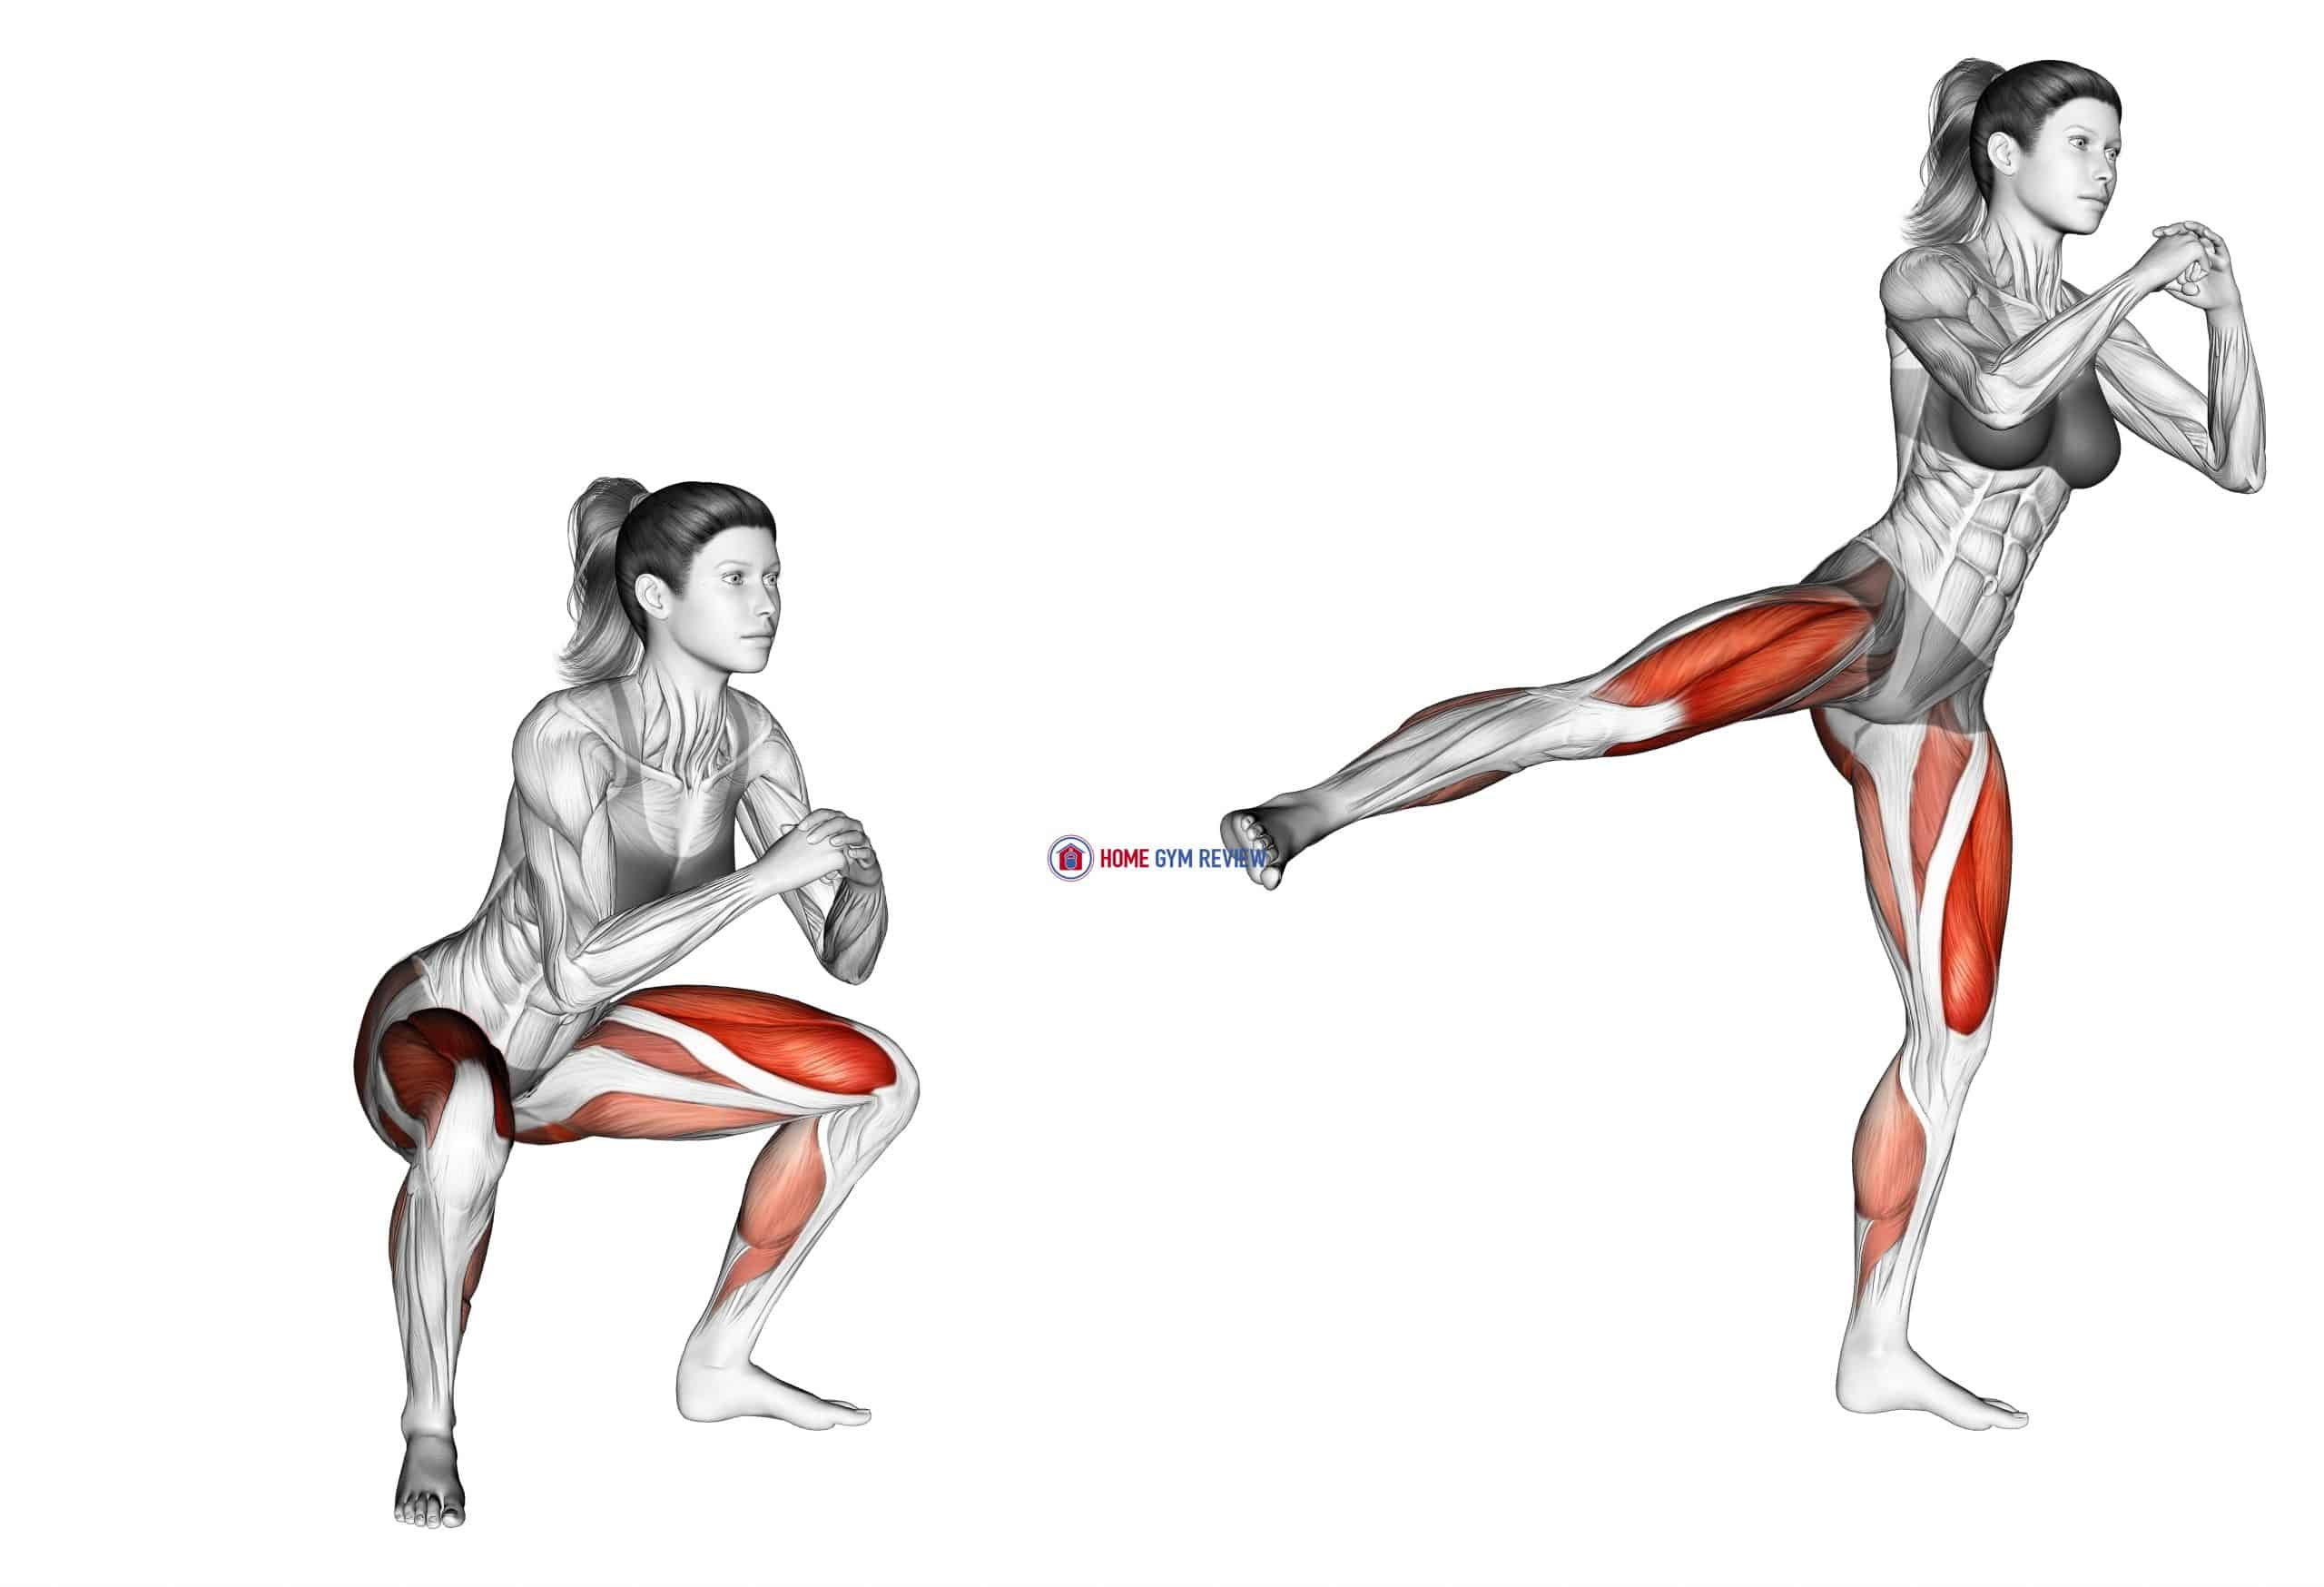 Squat side kick